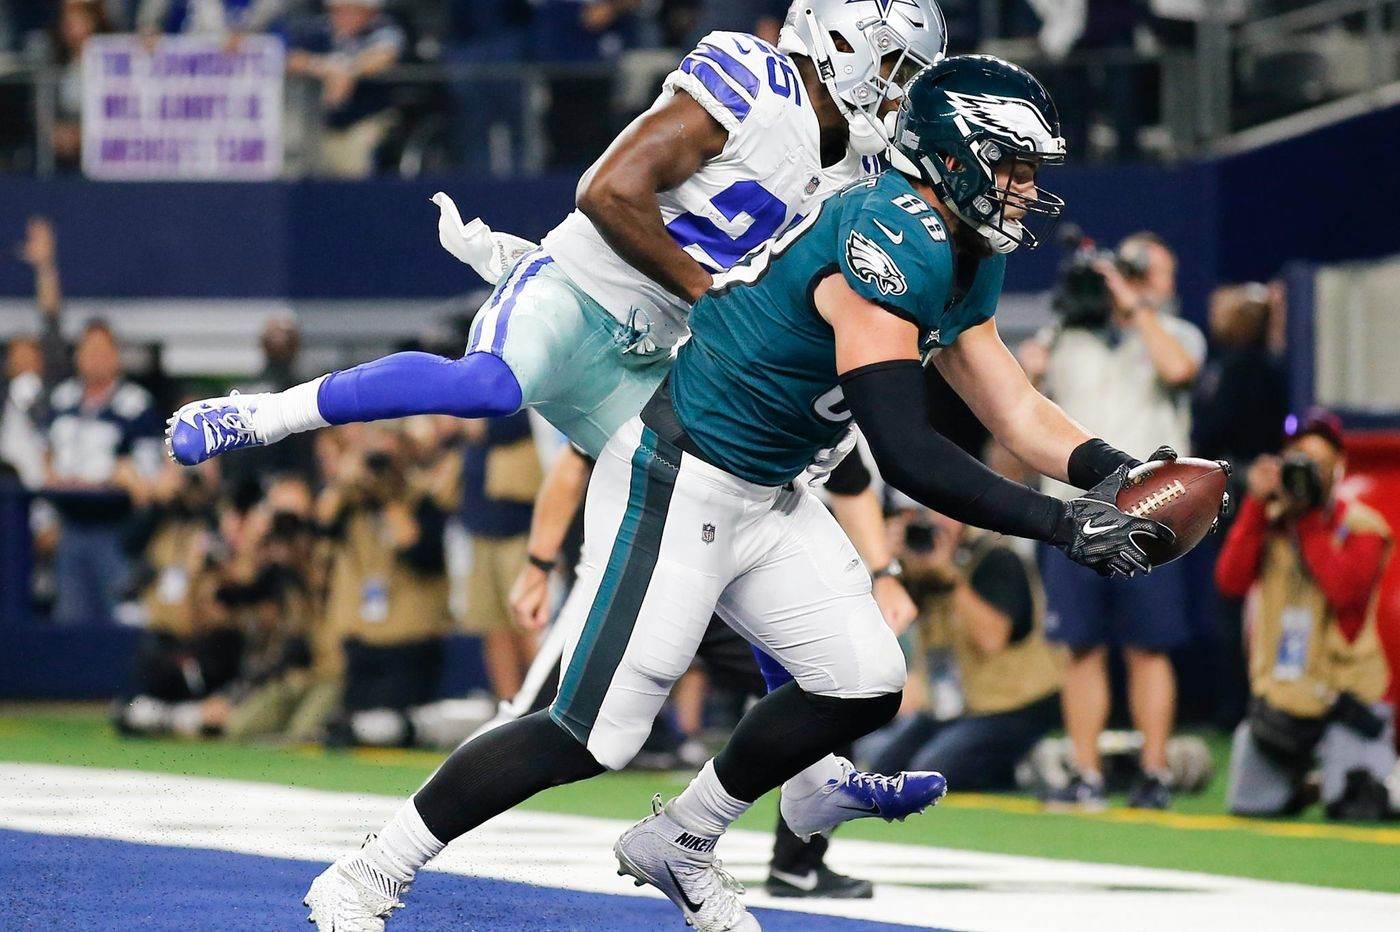 Cowboys Lassoing NFC East Title as NFC Dark Horse